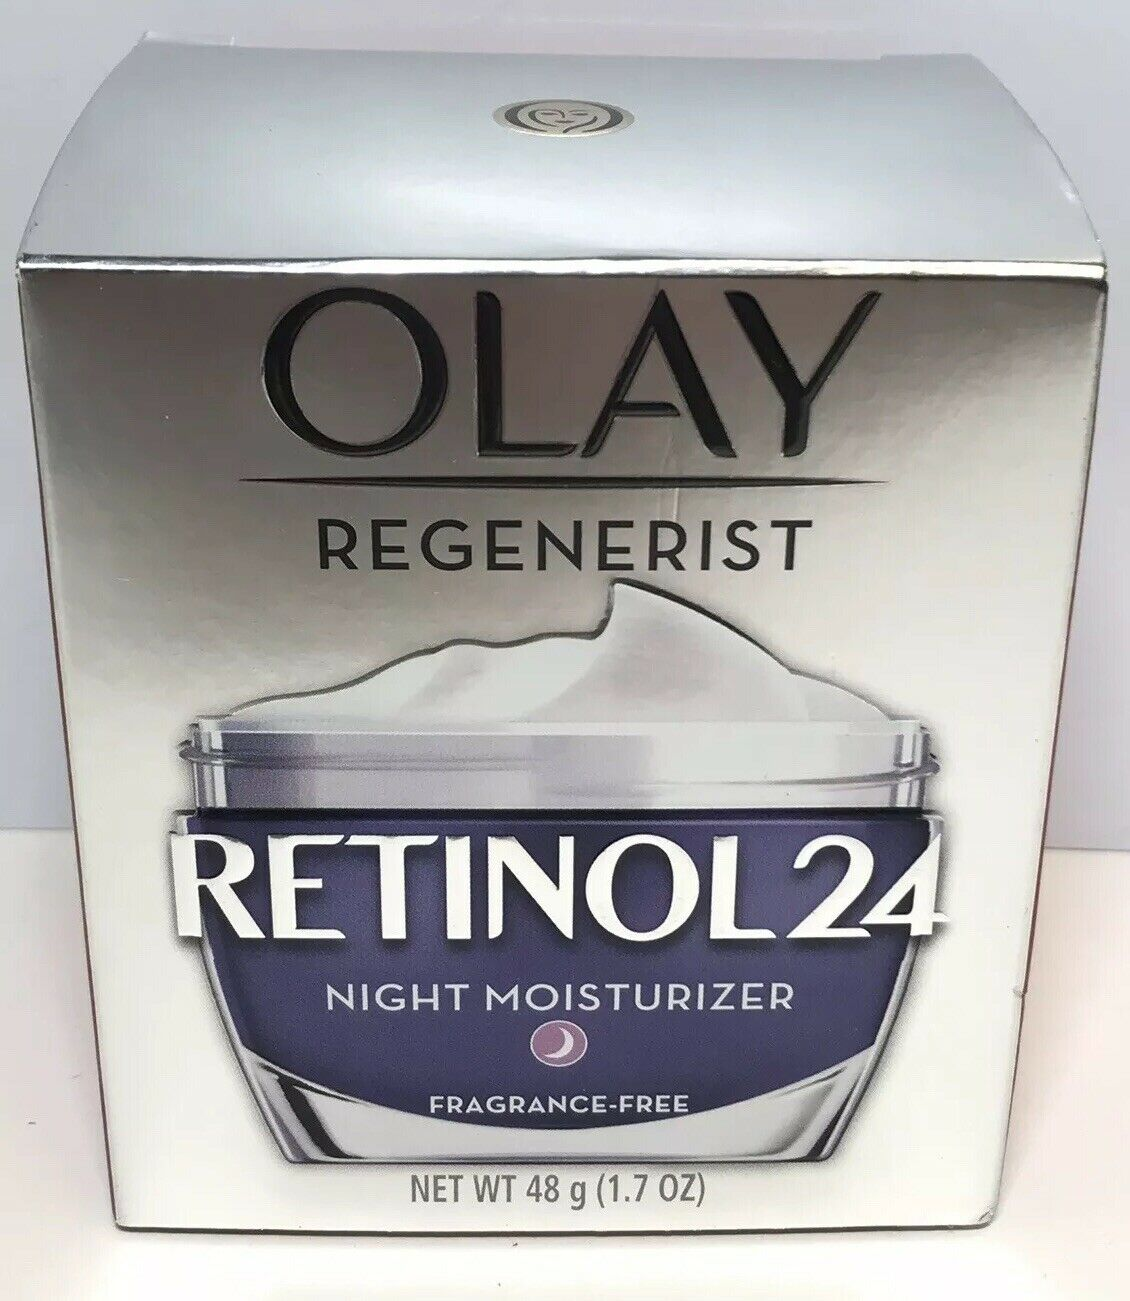 Olay Regenerist Retinol 24 Night Moisturizer  1.7 oz